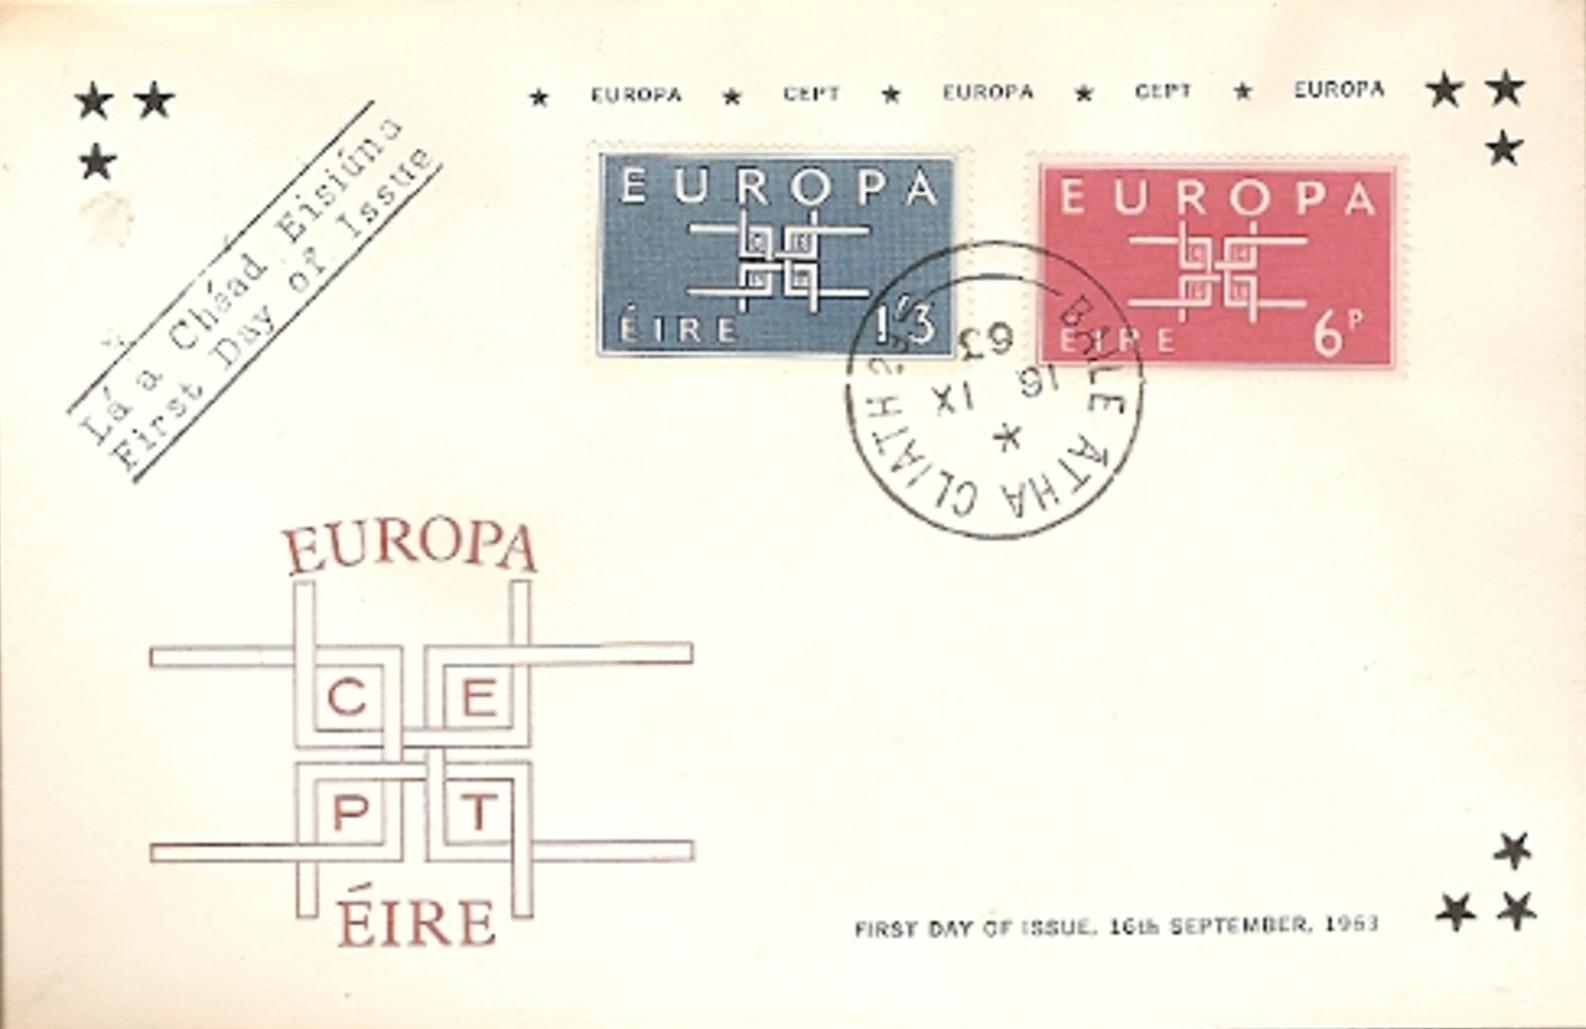 Ireland 1963 Europa FDCe.jpg